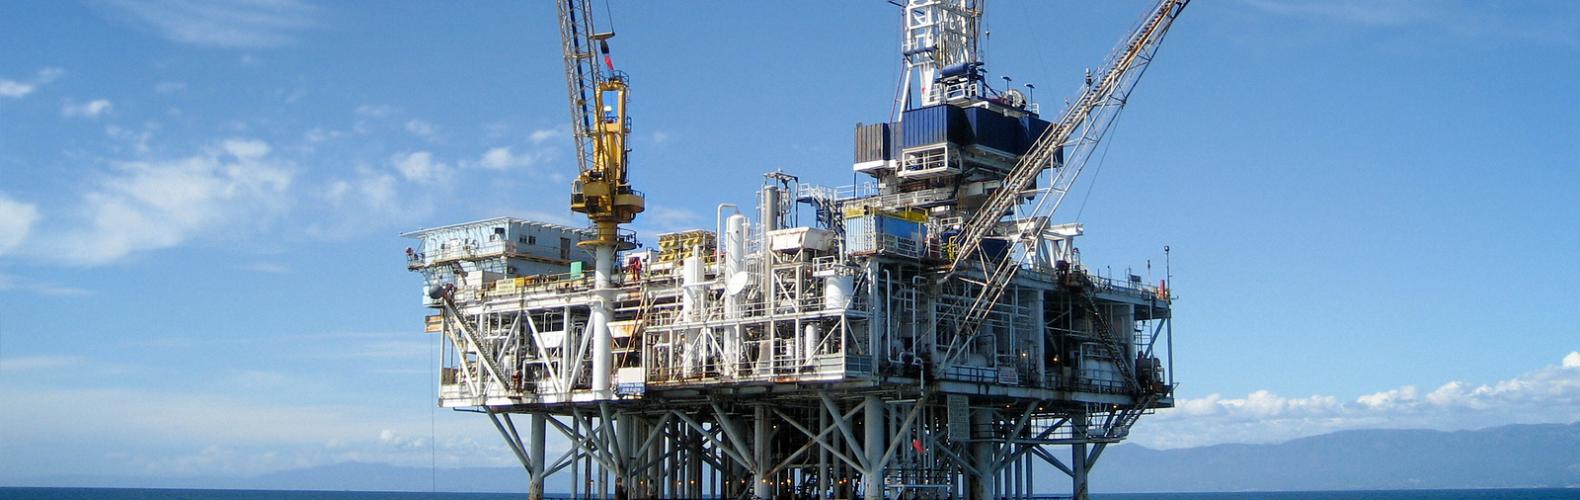 bigstock-Offshore-Oil-Rig-Drilling